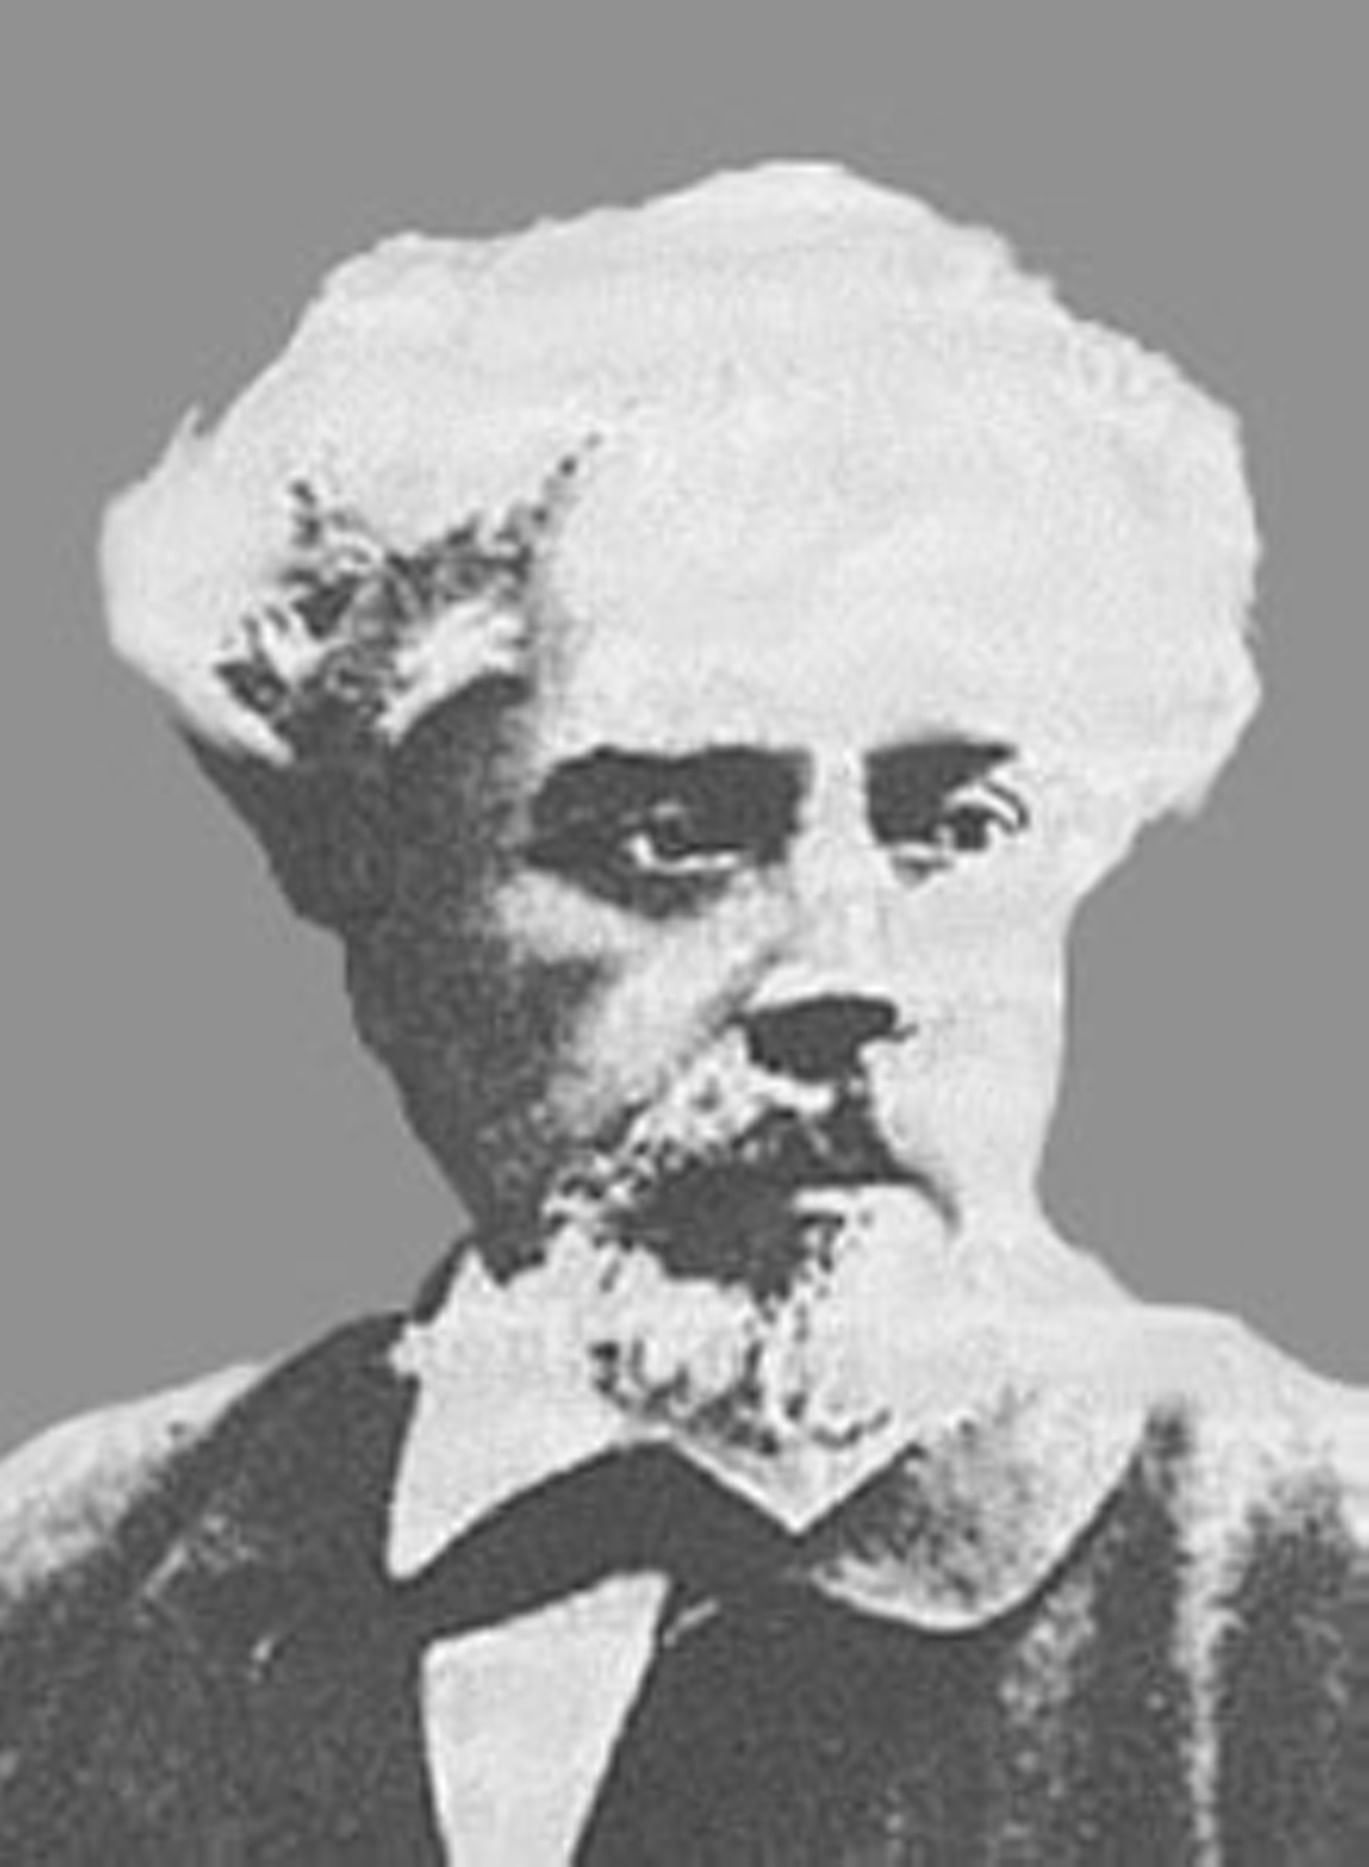 Литературная мистификация XIX века. Галерея 1